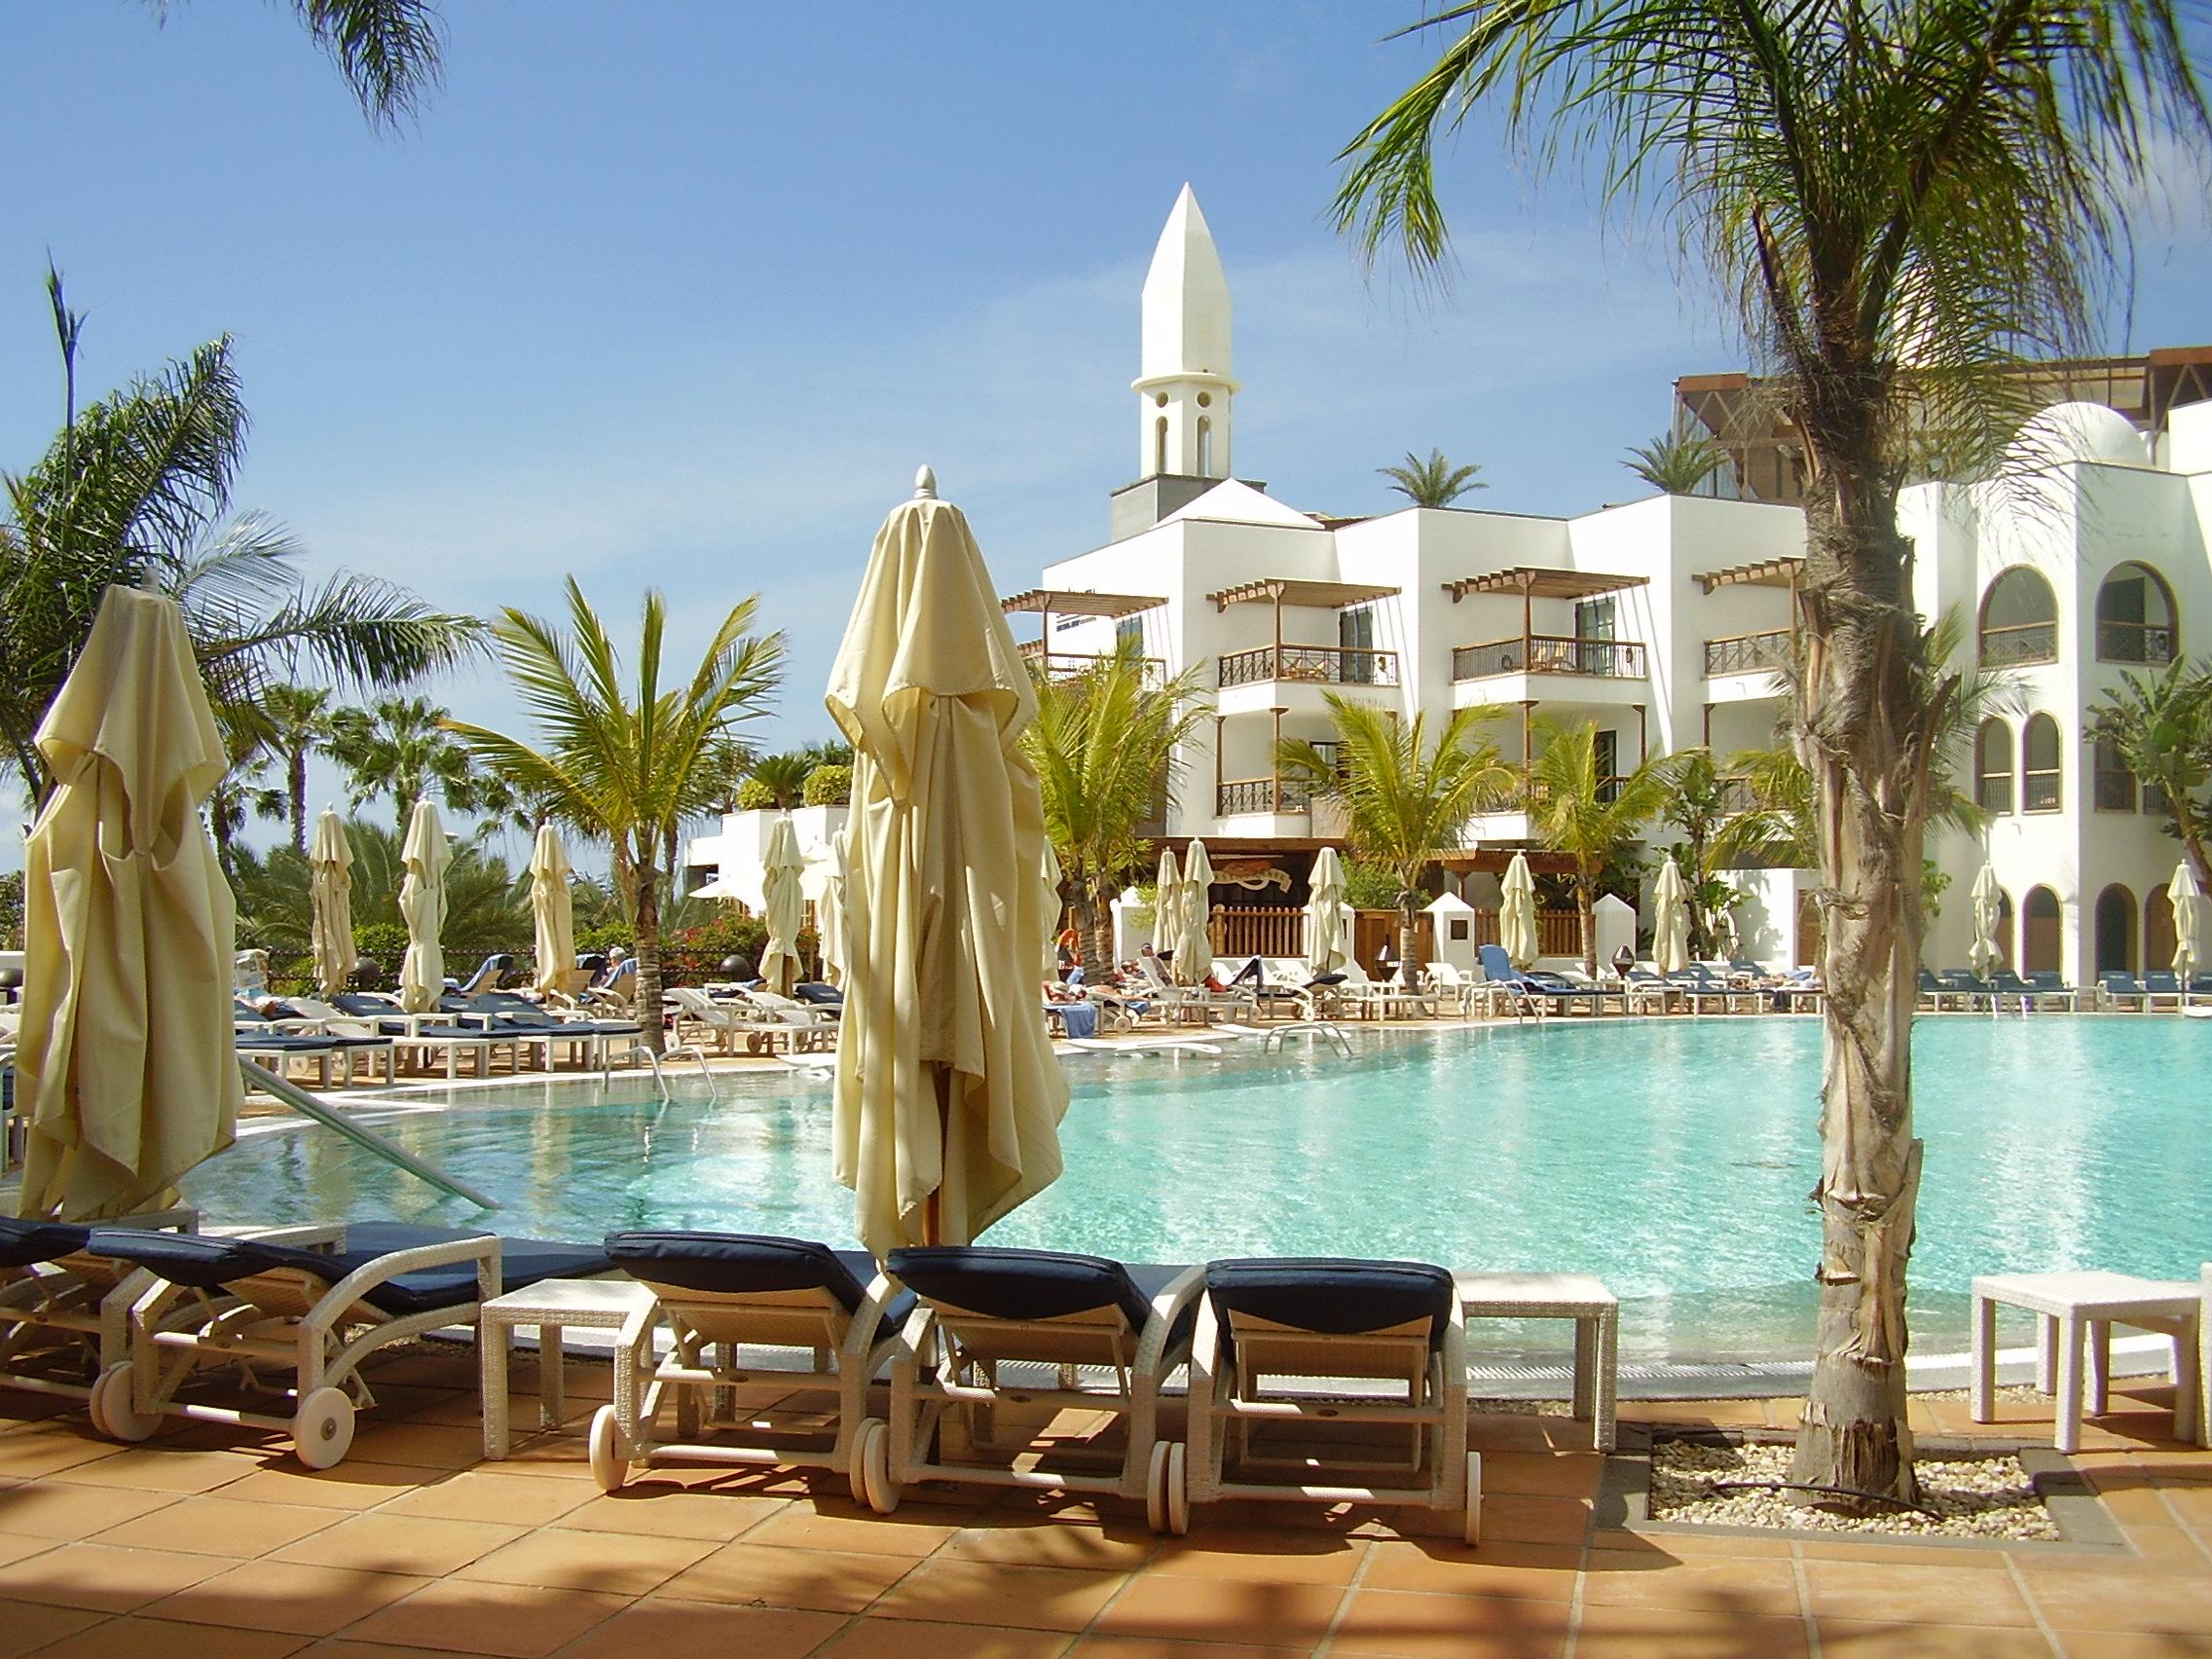 Prince Resort In North Myrtle Beach South Carolina